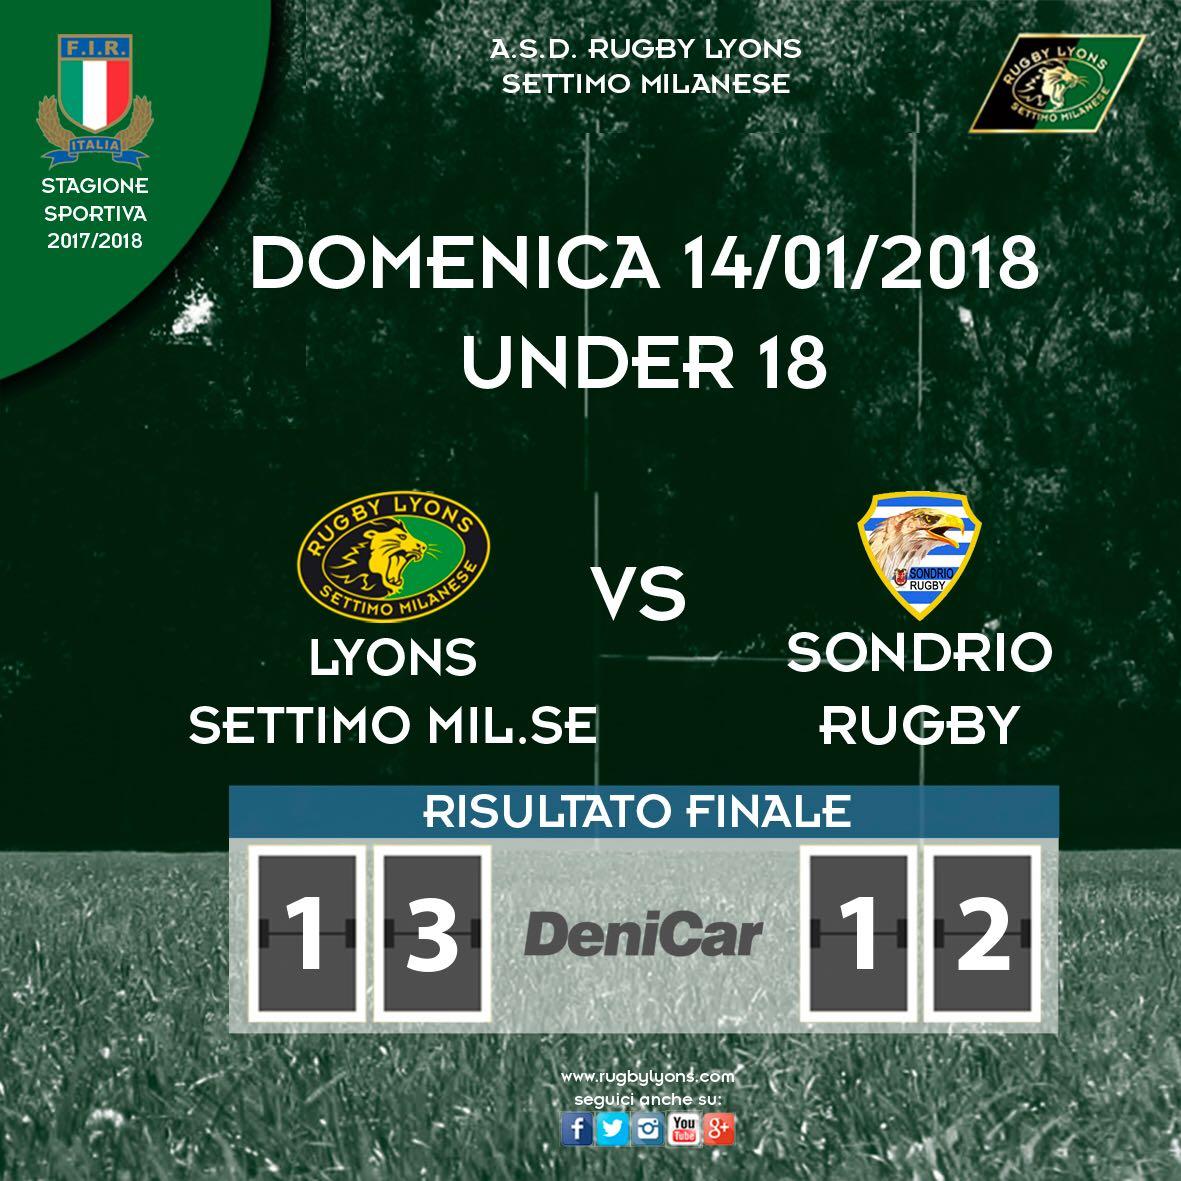 Under 18 Risultato partita Rugby Lyons vs Sondrio Rugby